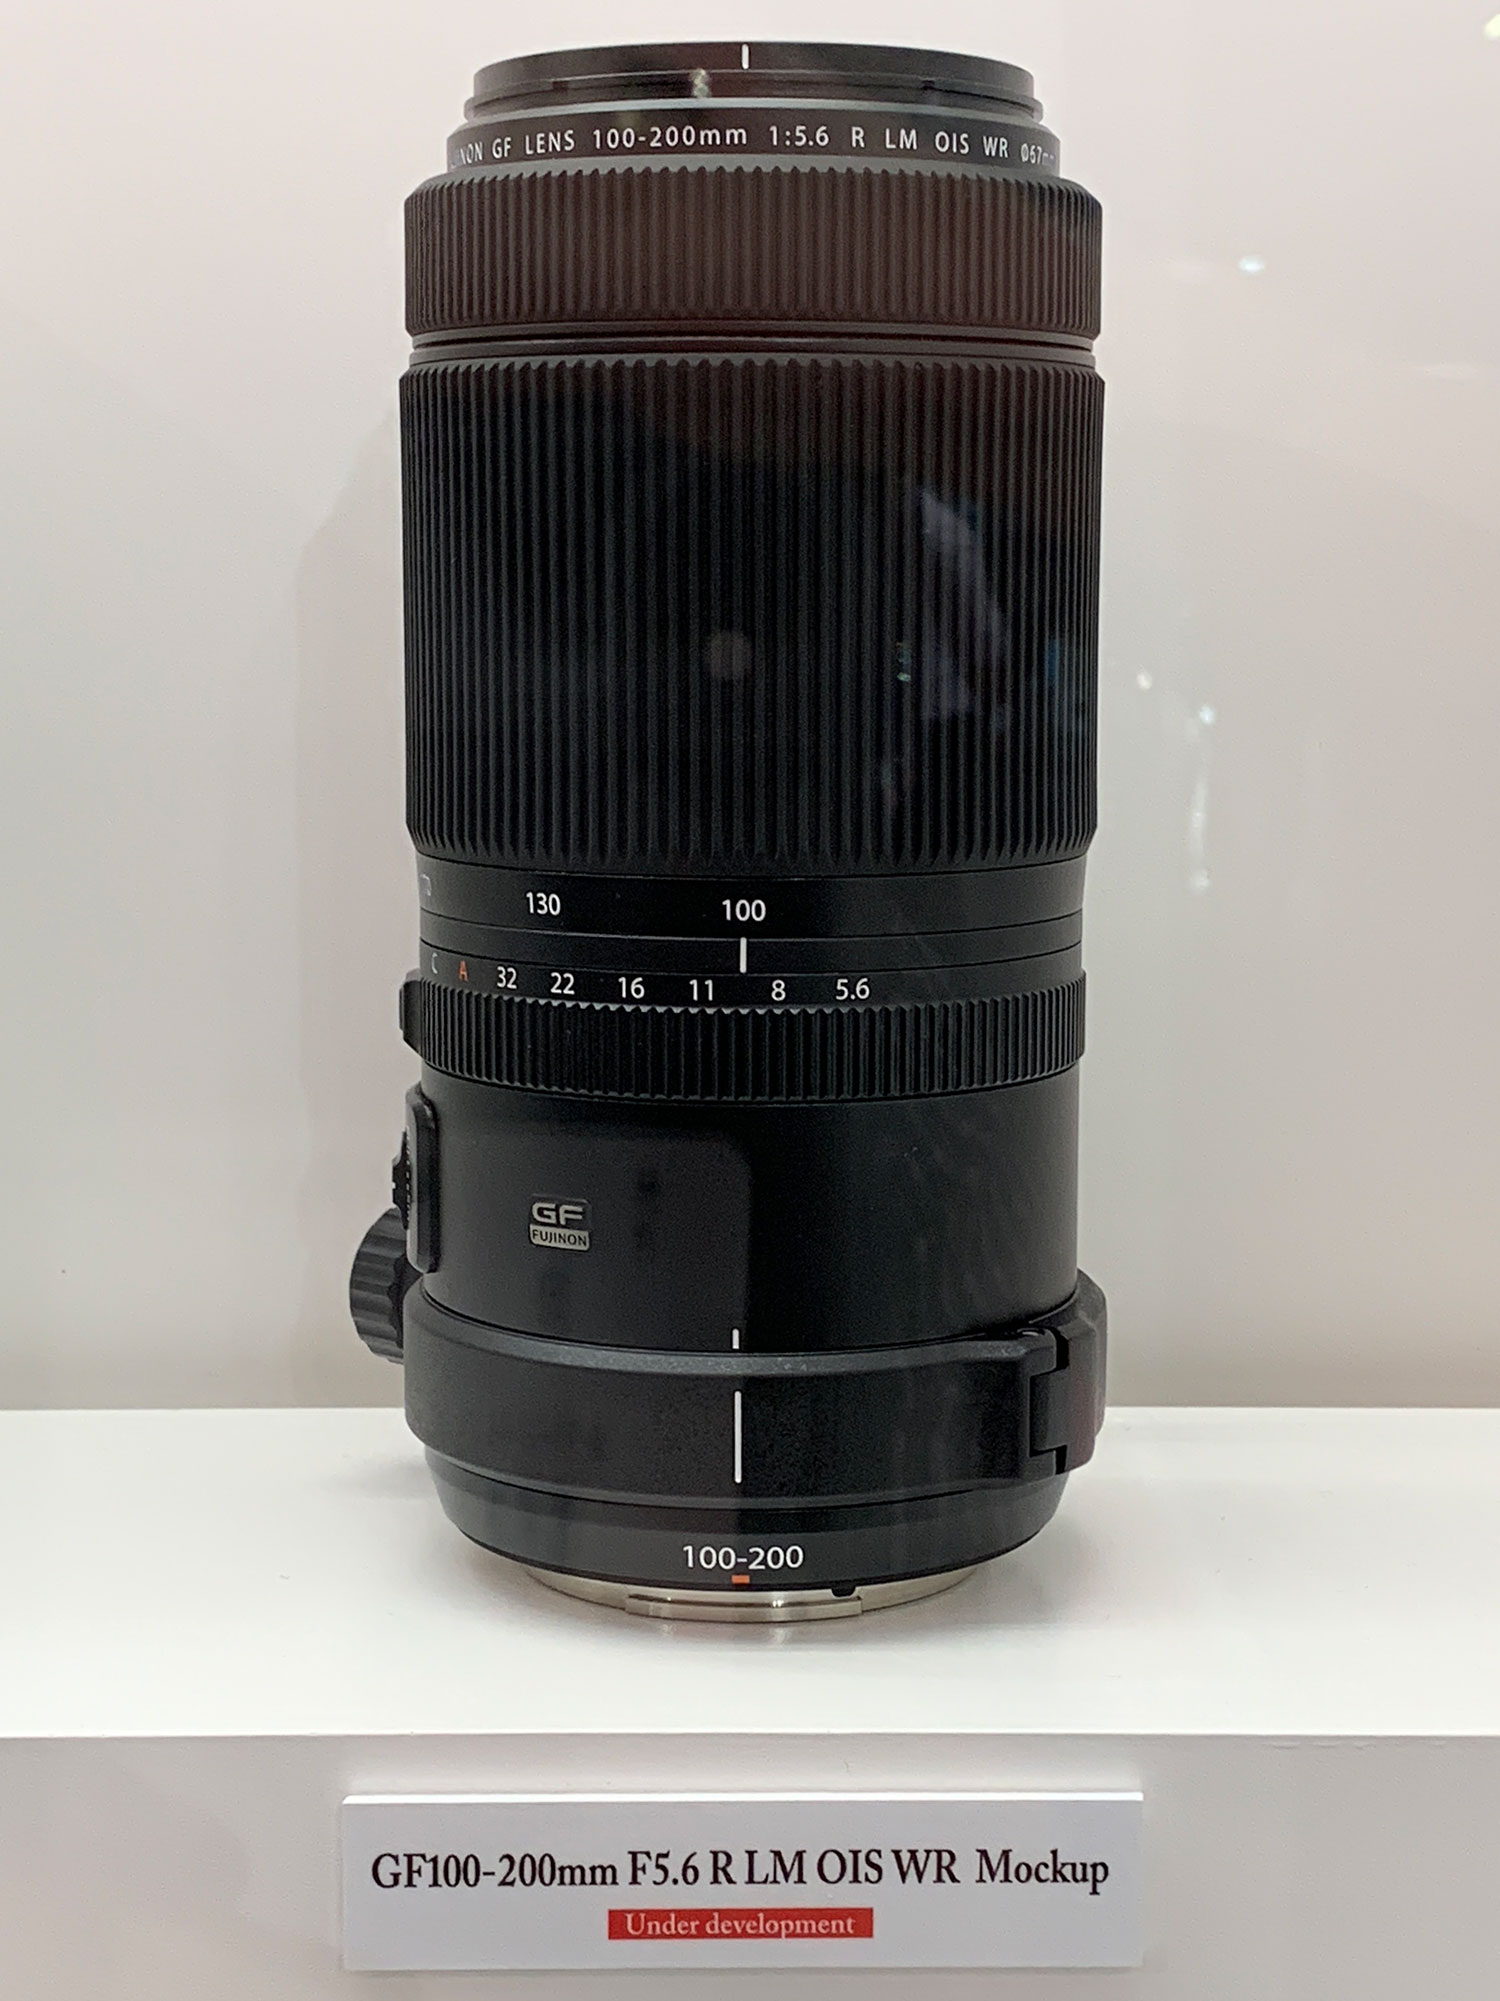 New roadmap for Fujifilm GF lenses unveilled